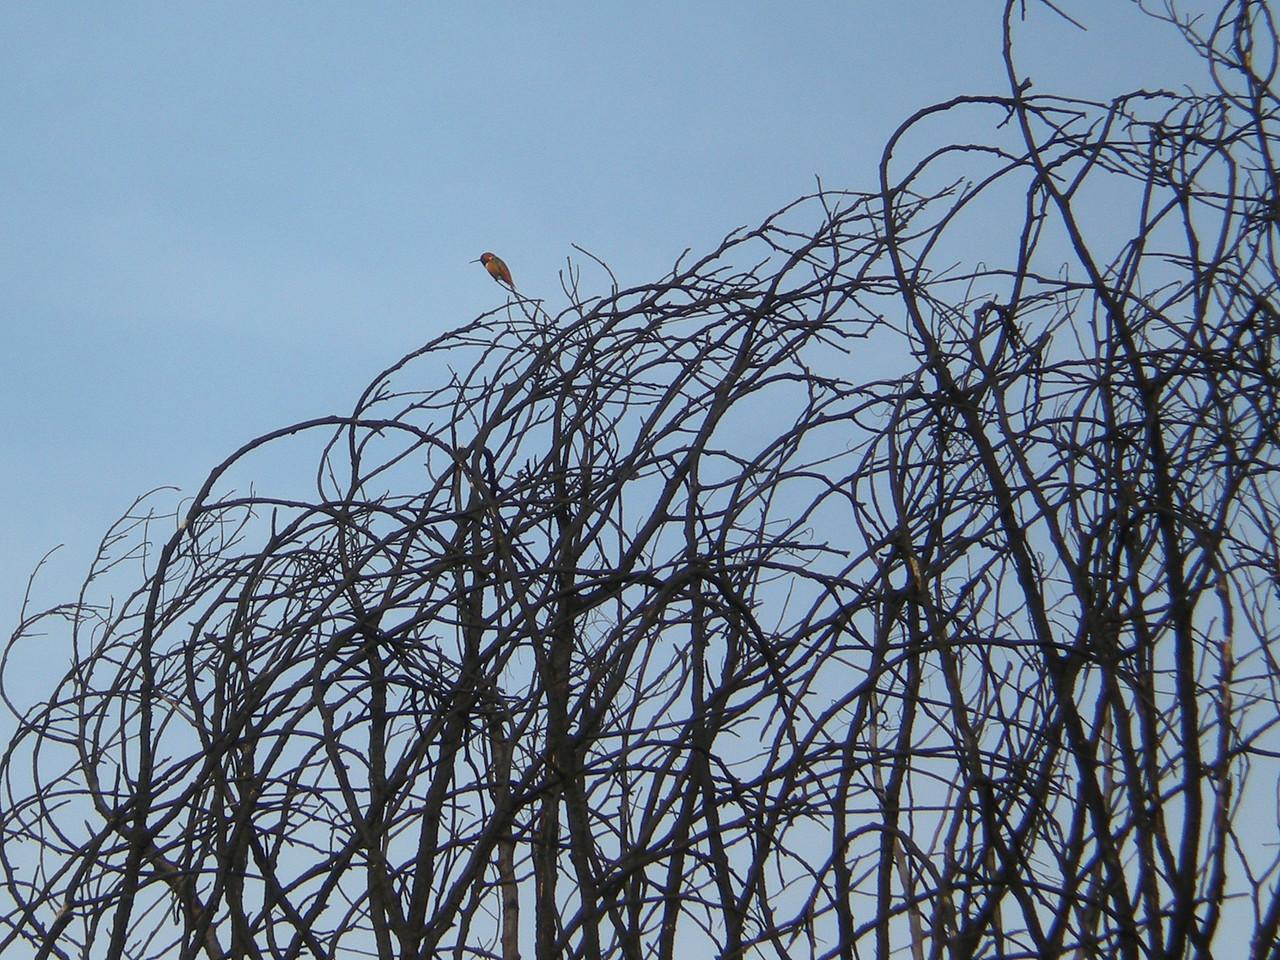 Hummingbird on the watch.